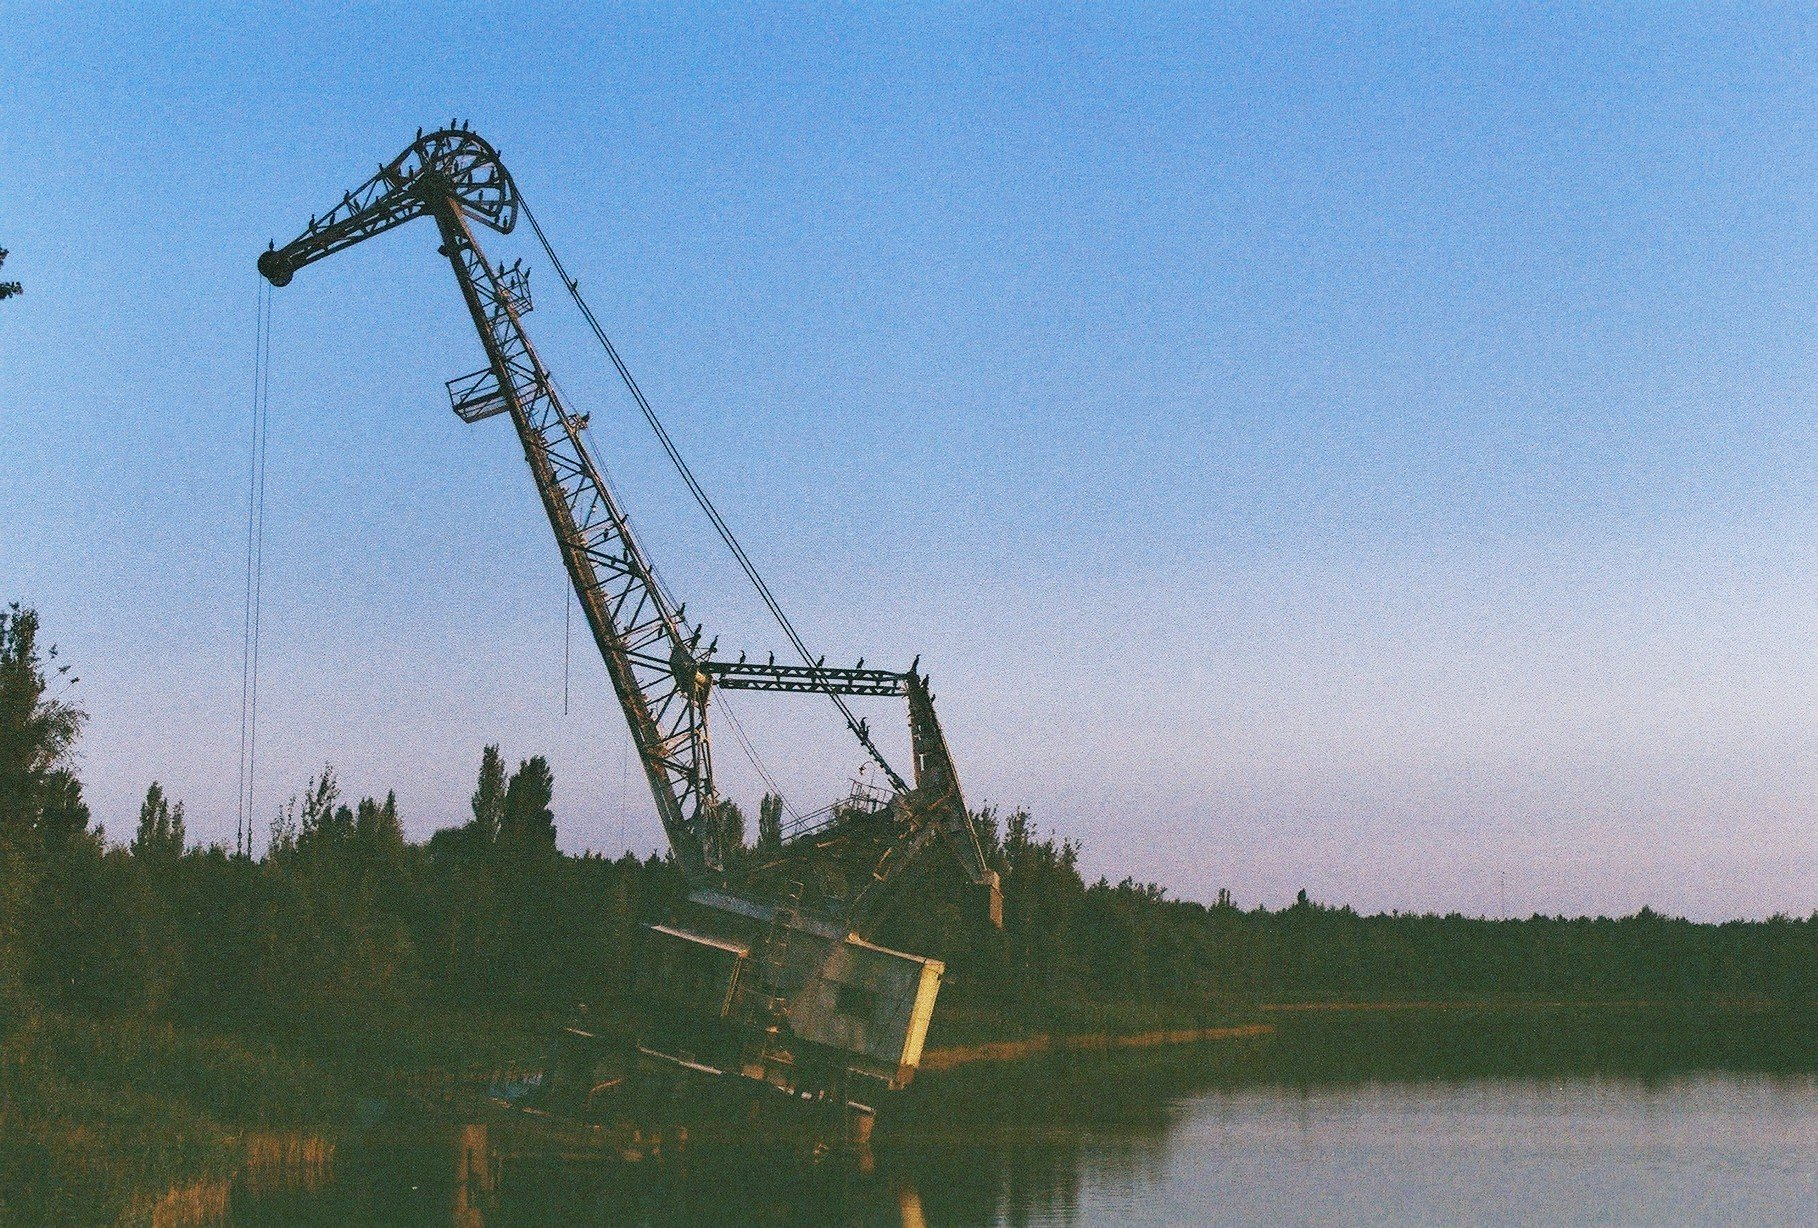 snaeking-into-chernobyl7 SNEAKING INTO CHERNOBYL